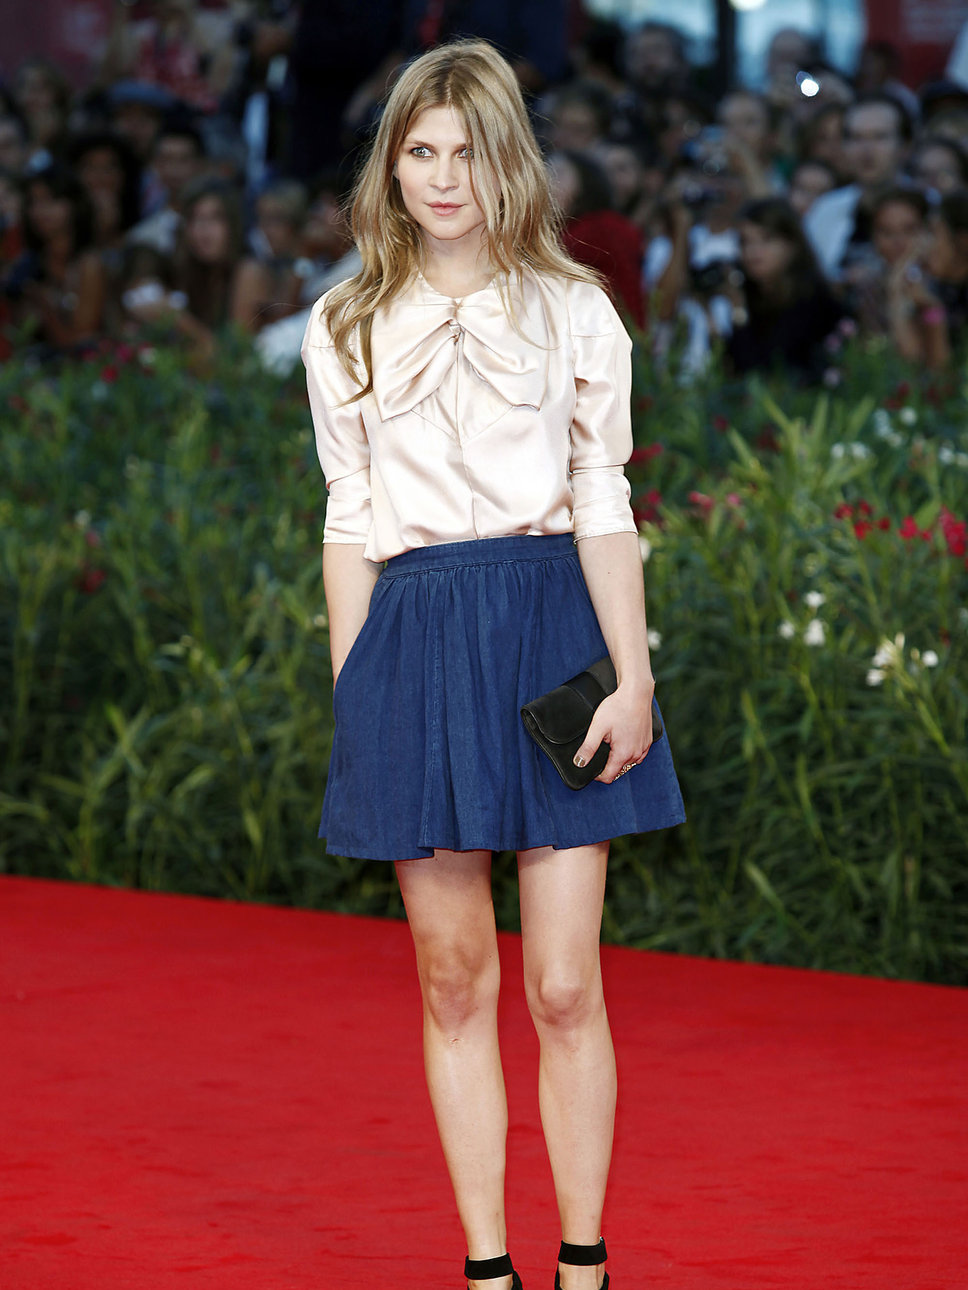 2012 Pleated Skirt - Clemence Poesy